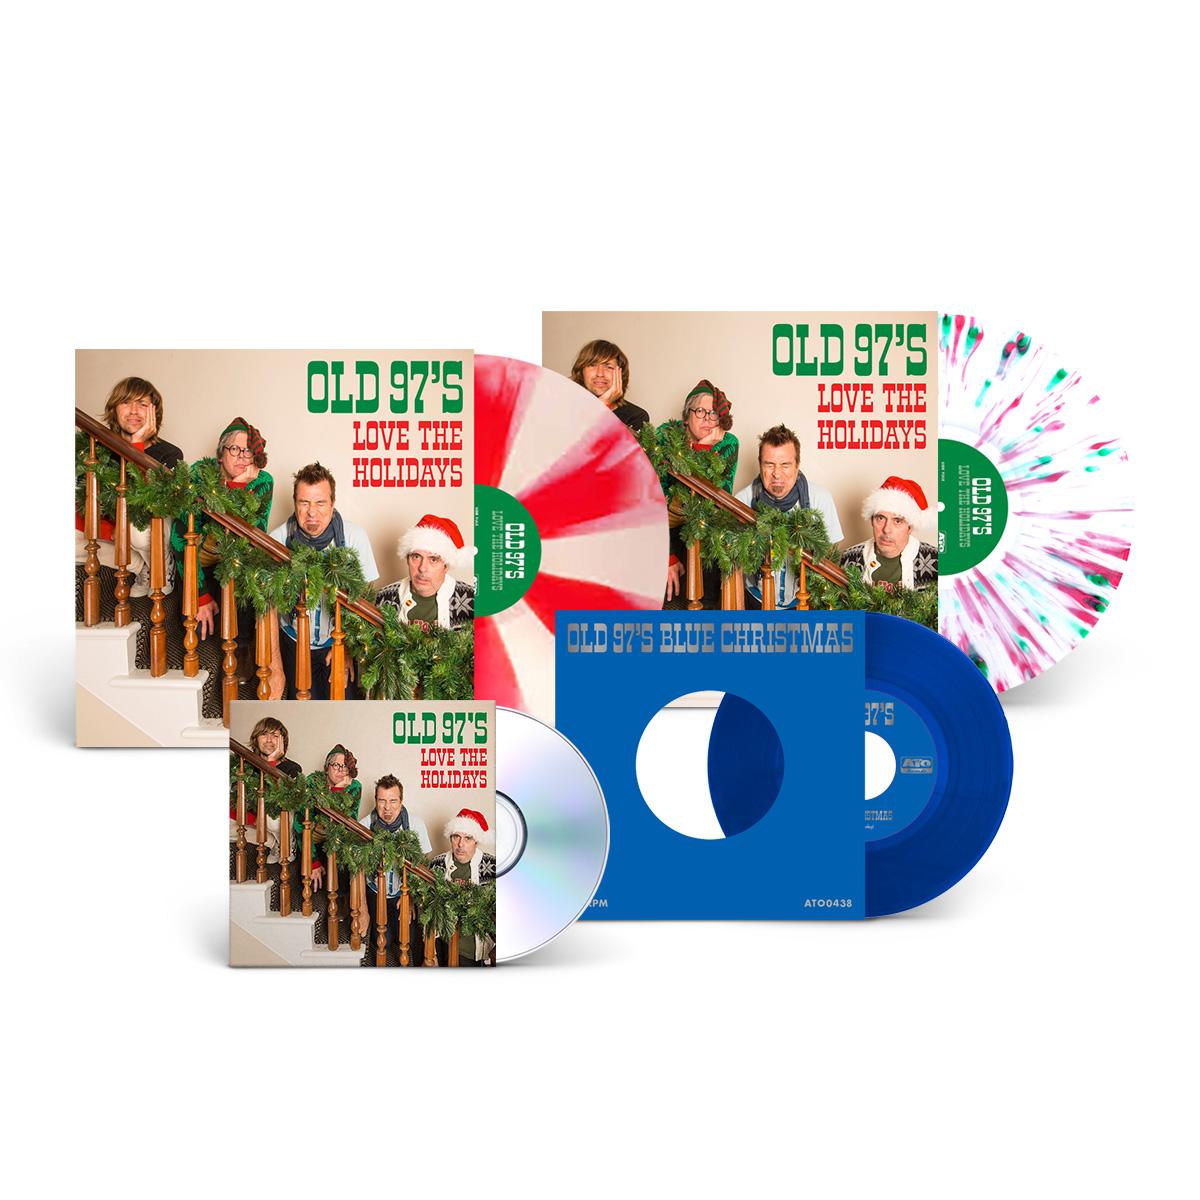 Blue Christmas Holiday Bundle